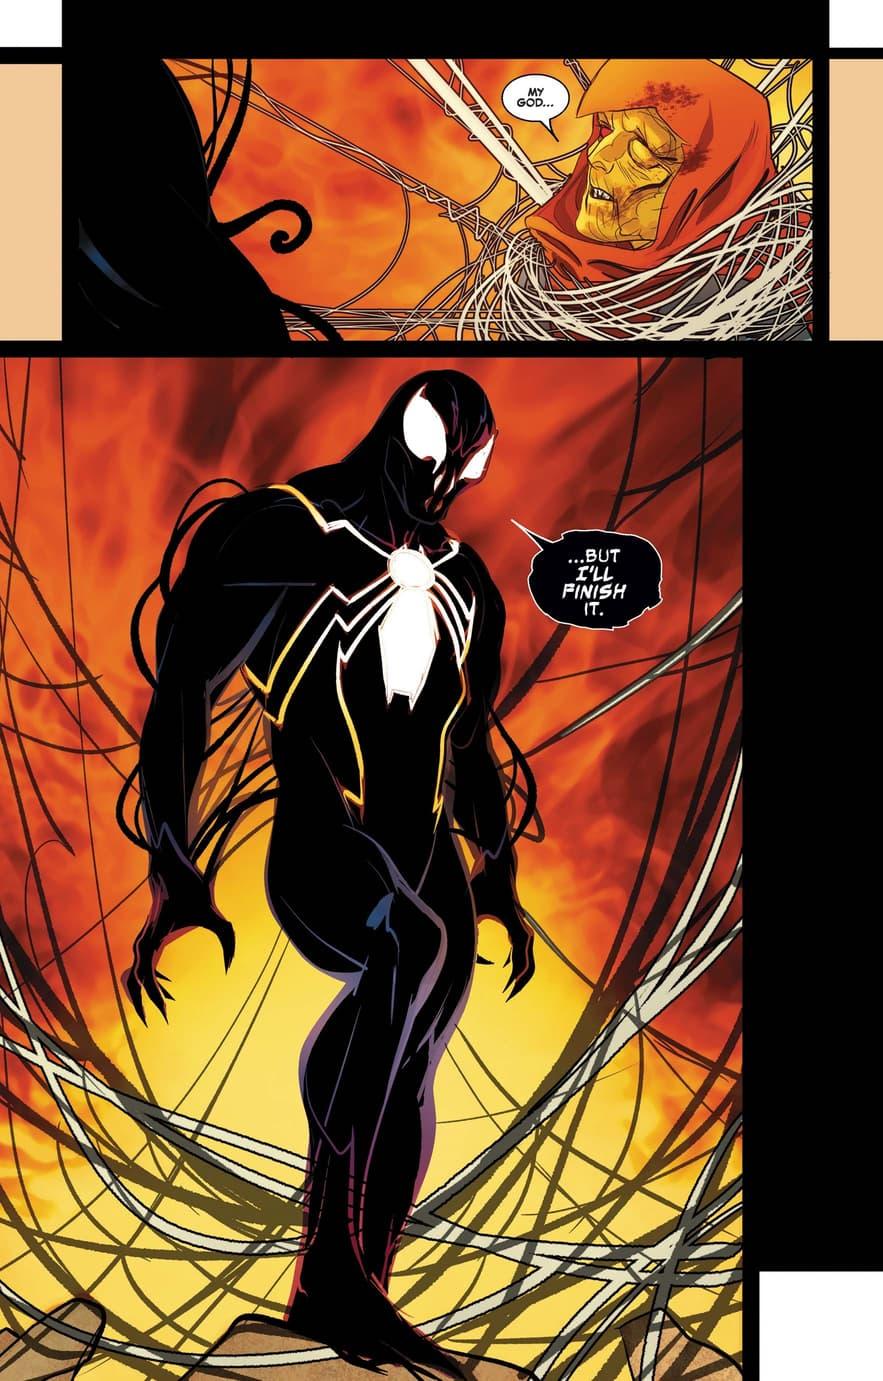 A black suited Spider-Man menaces Hobgoblin.